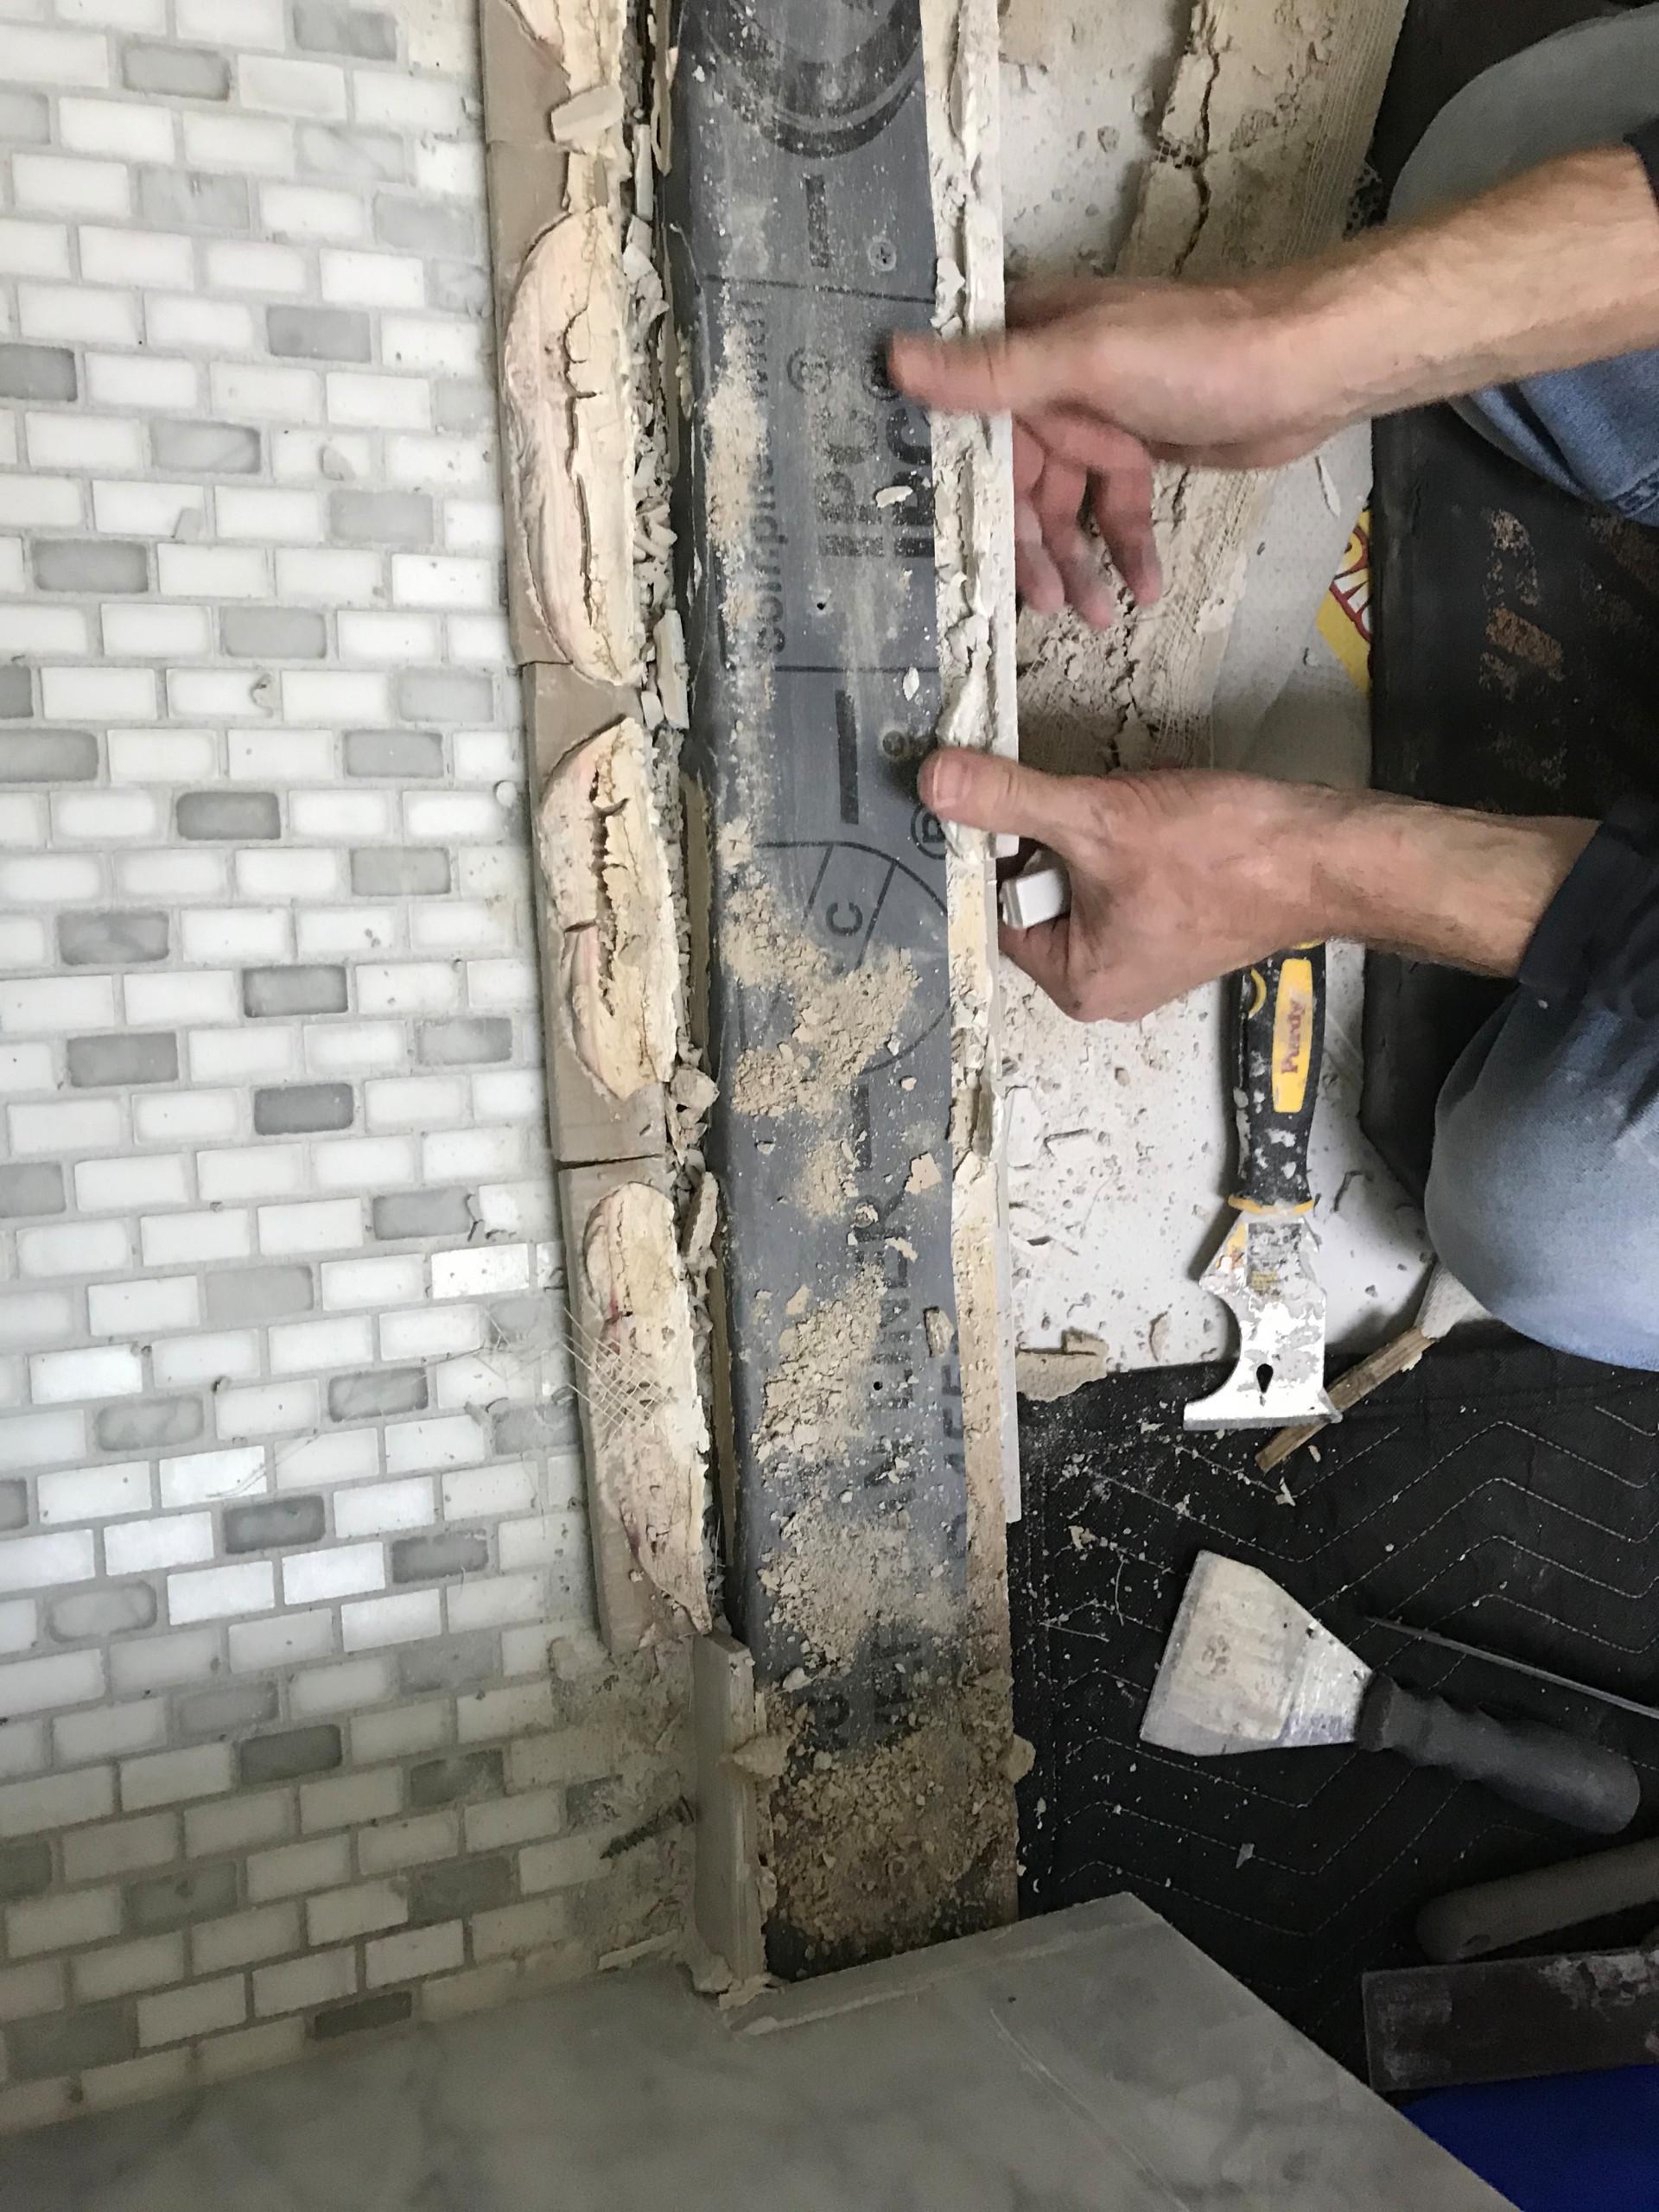 Severna Park Shower Leak and Tile Floor Repair Project